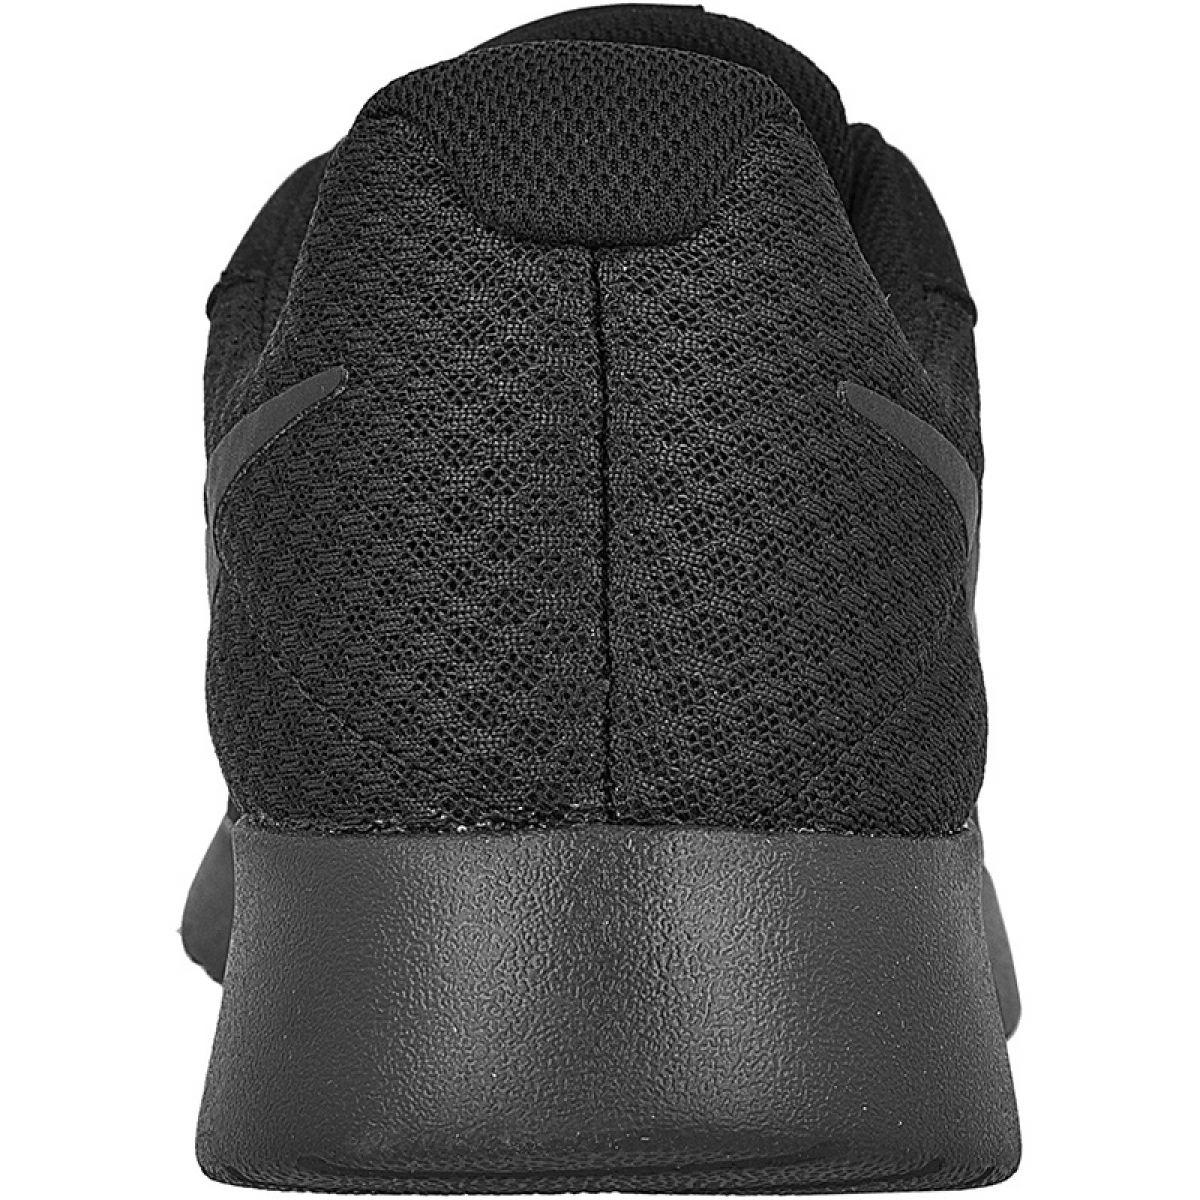 pas mal ac561 66da0 Black Nike Tanjun M 812654-001 shoes